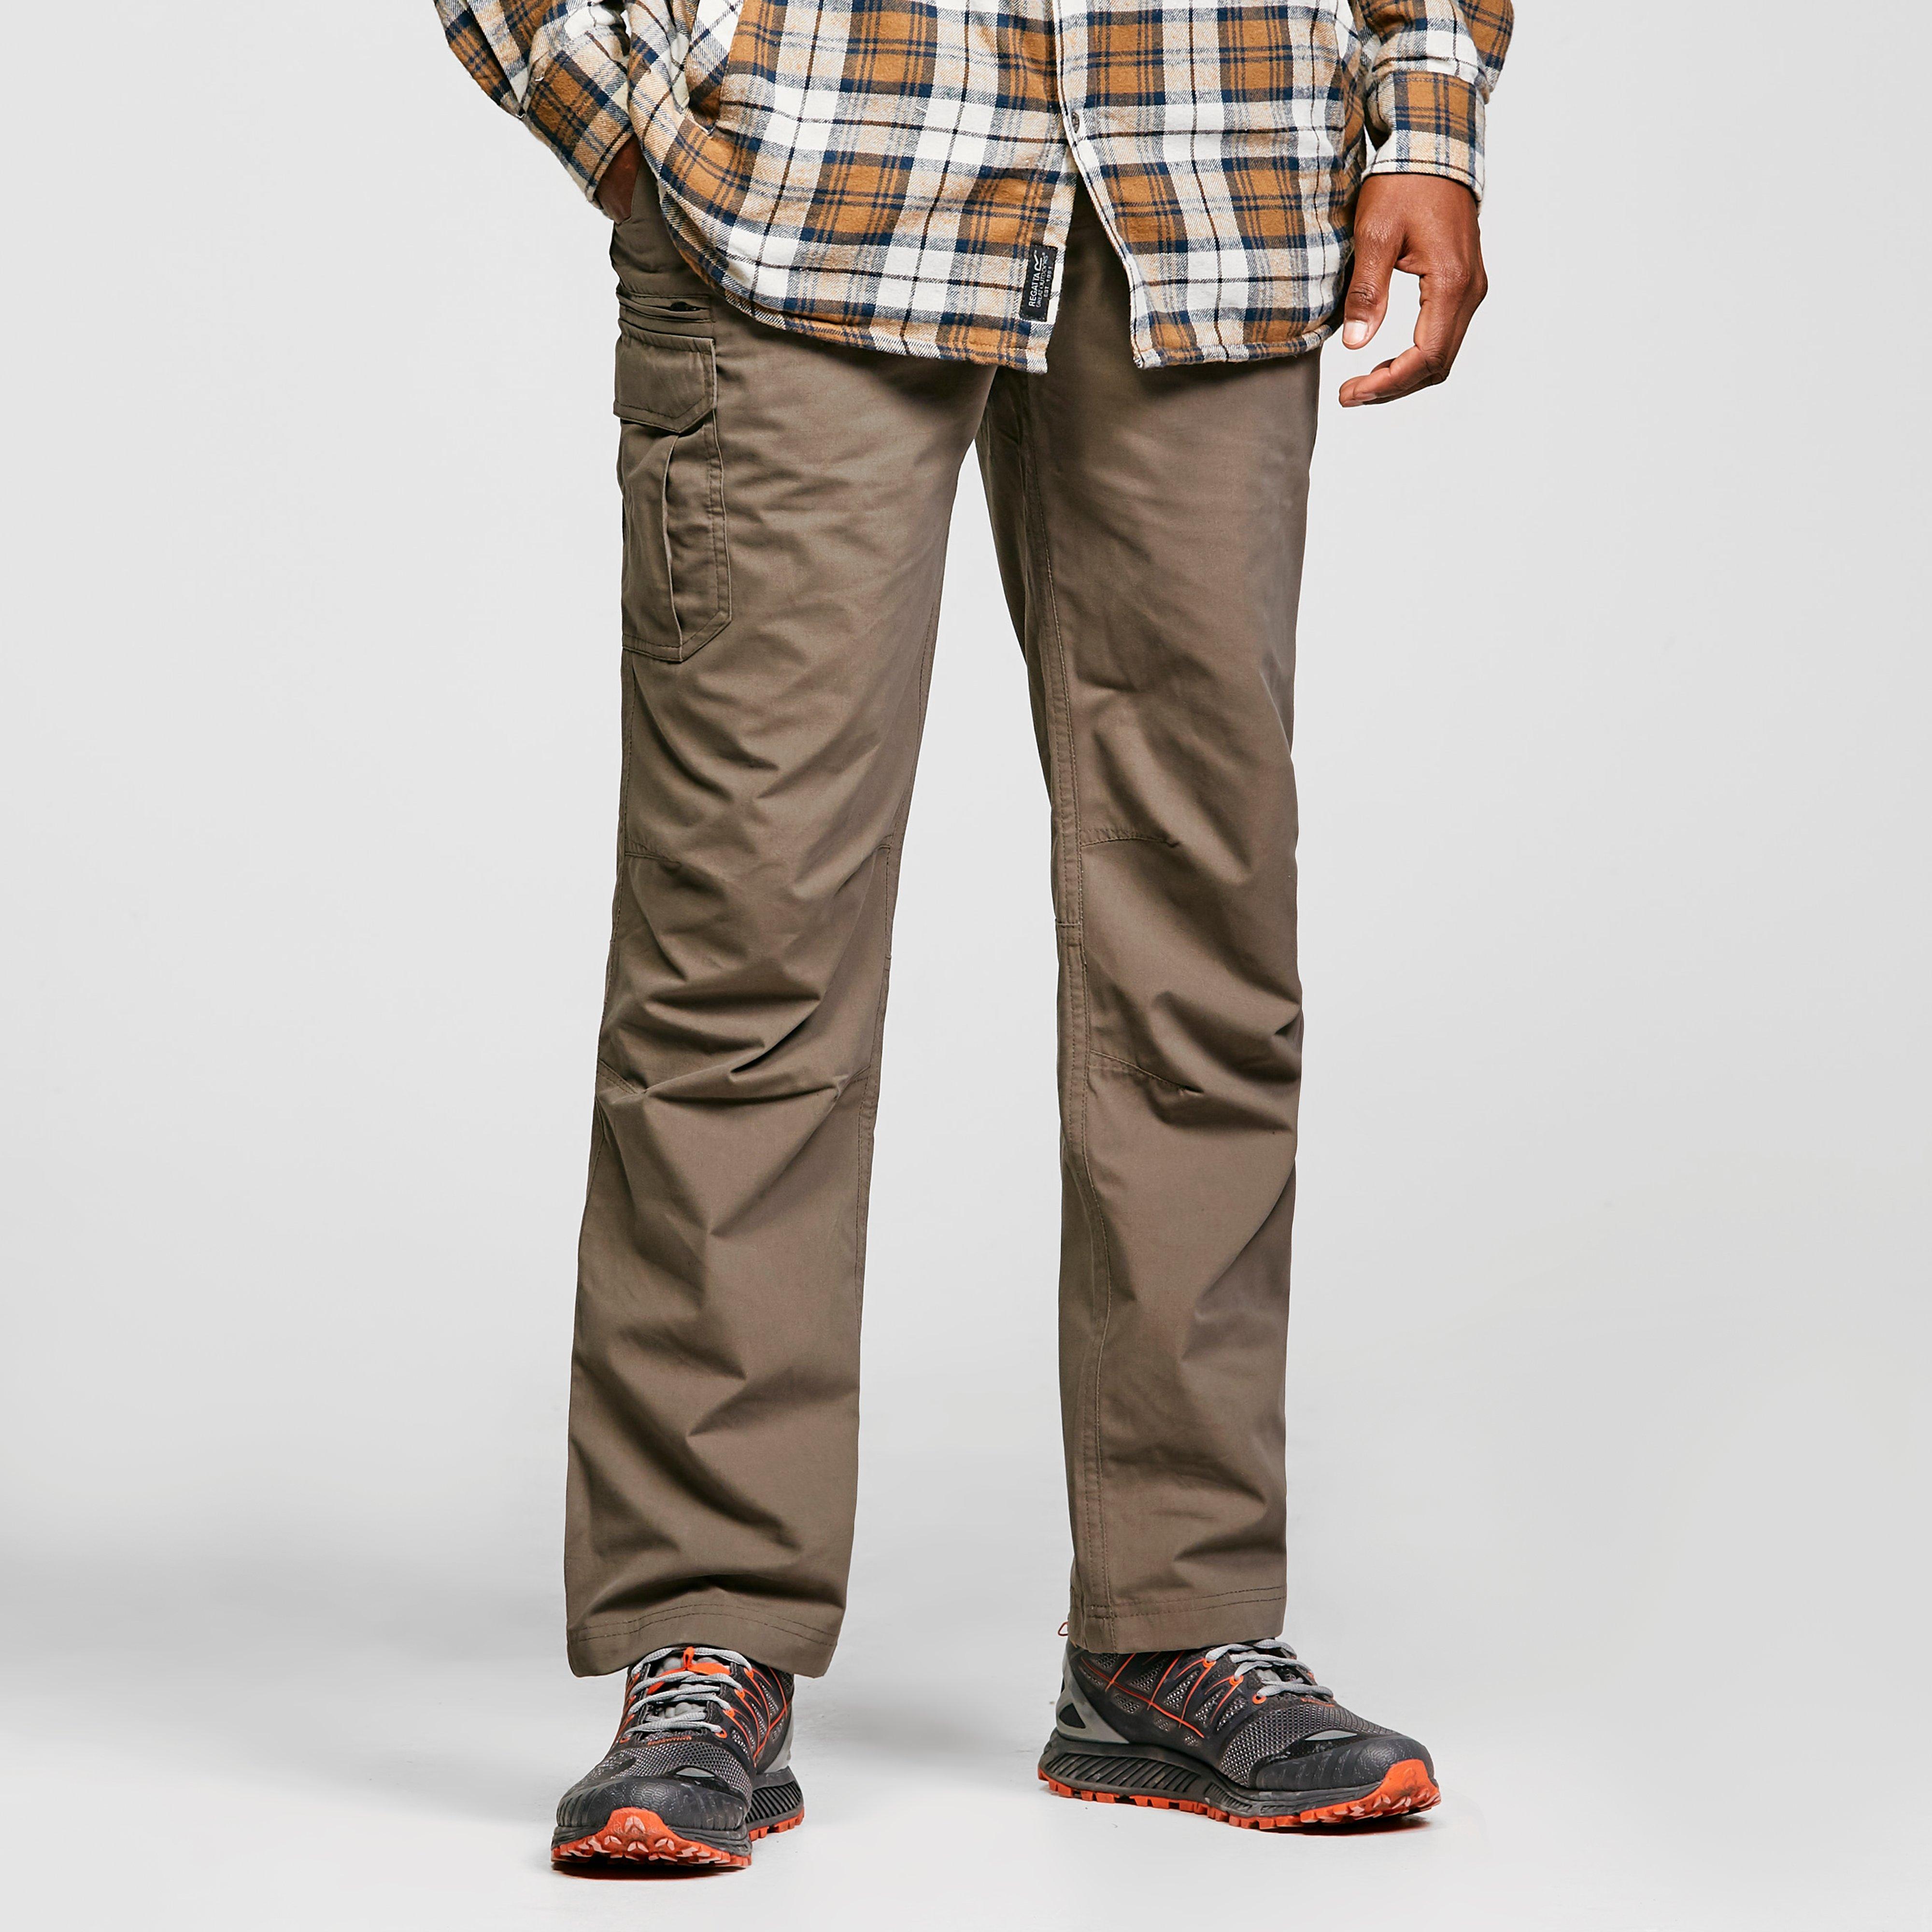 Brasher Brasher Mens Walking Trousers - Brown, Brown